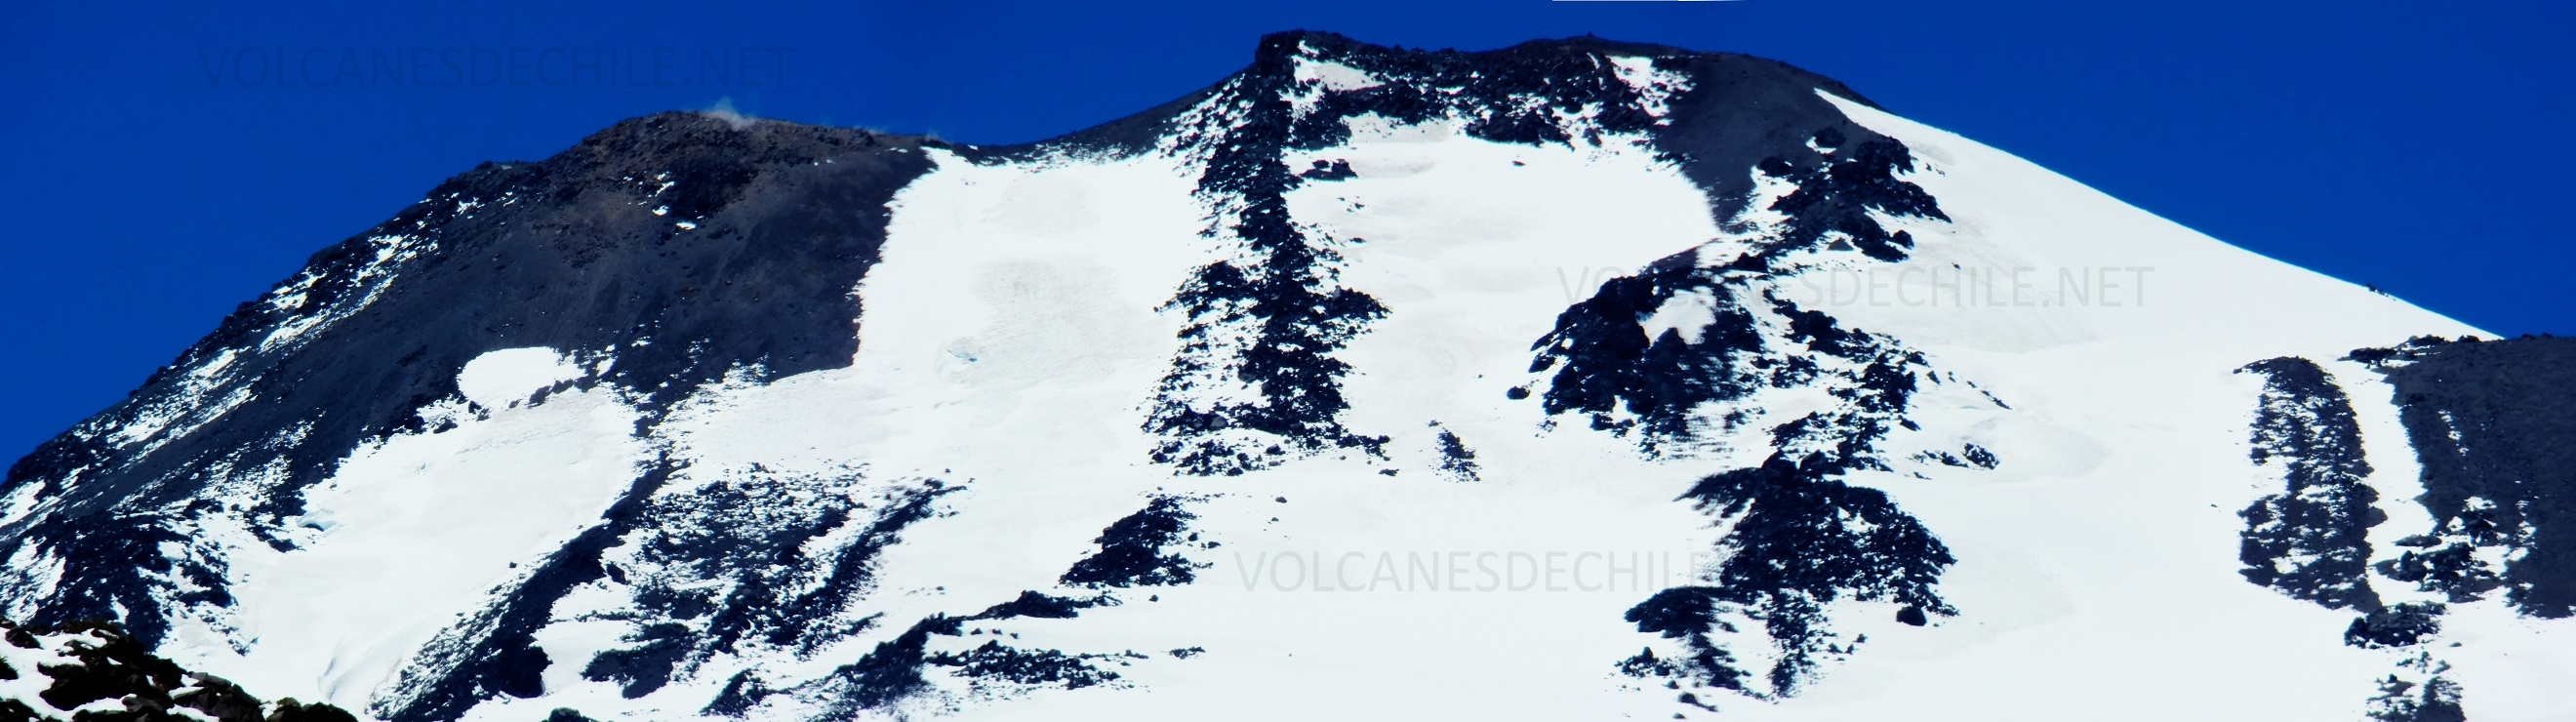 Volcán Chillán Nuevo